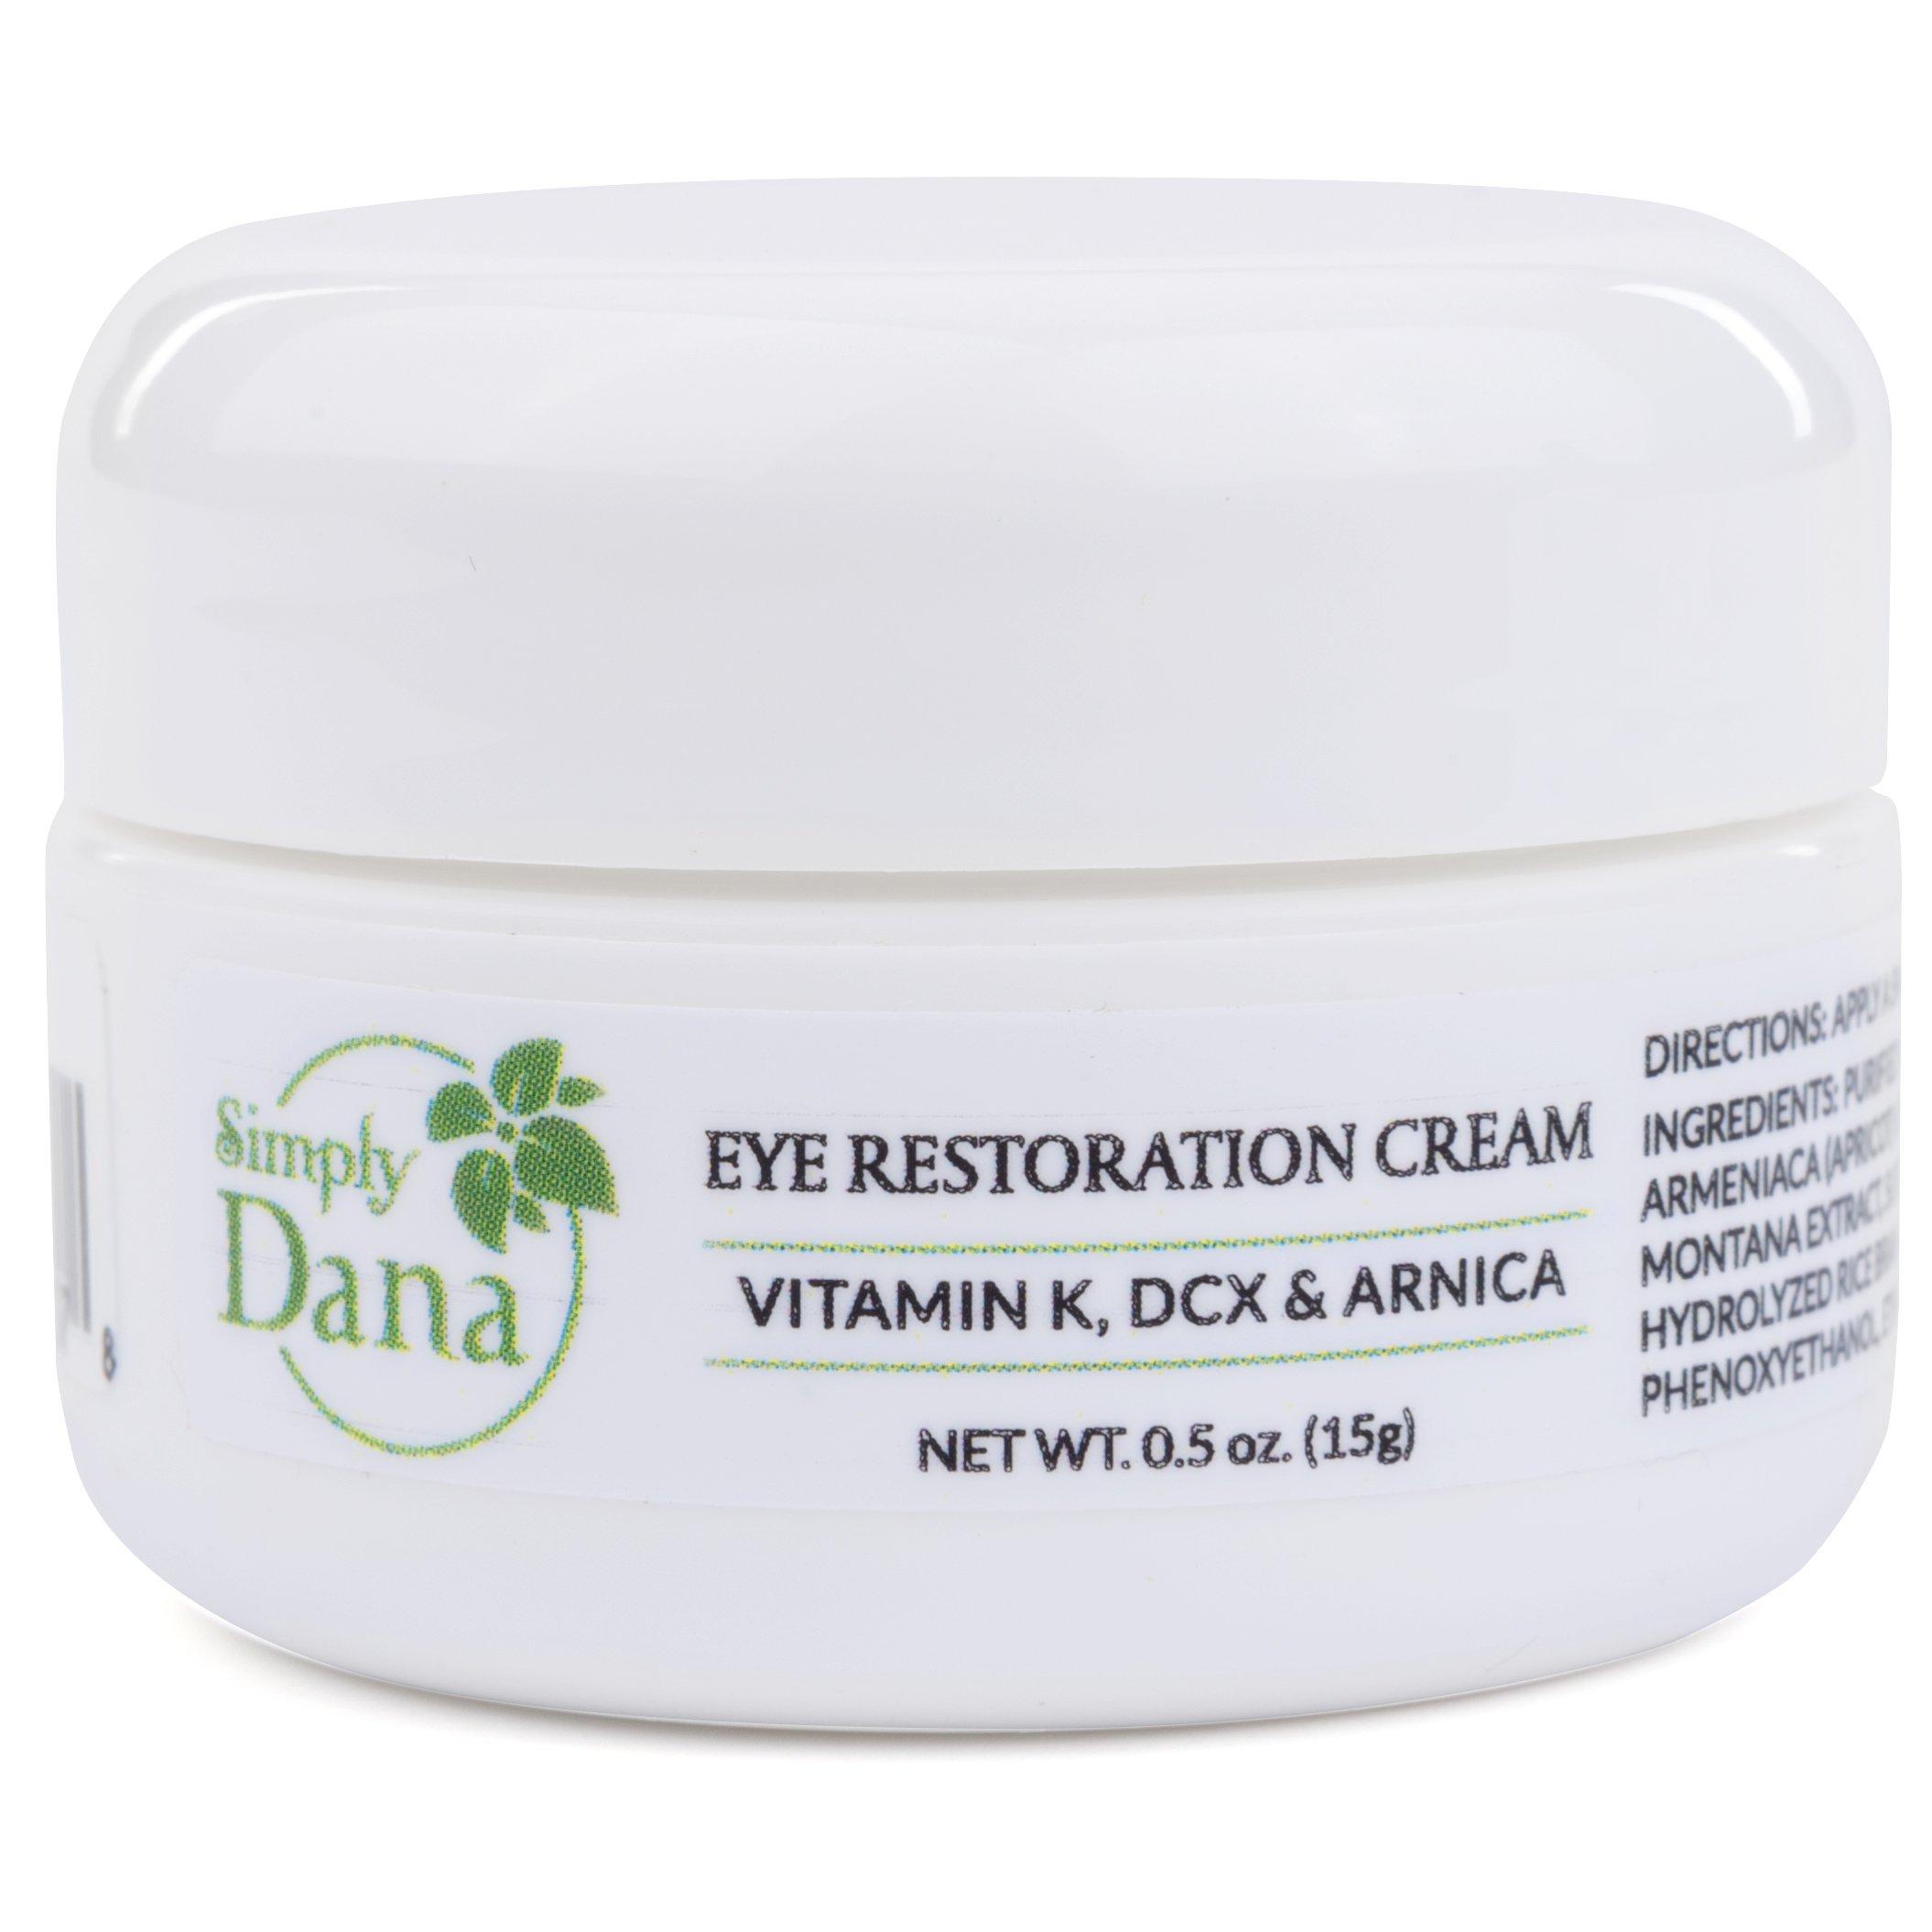 Simply Dana Eye Restoration Cream Vitamin K Dcx Ql Eyebrow 15gr Arnica Remove Dark Circles 05 Oz 15g Beauty